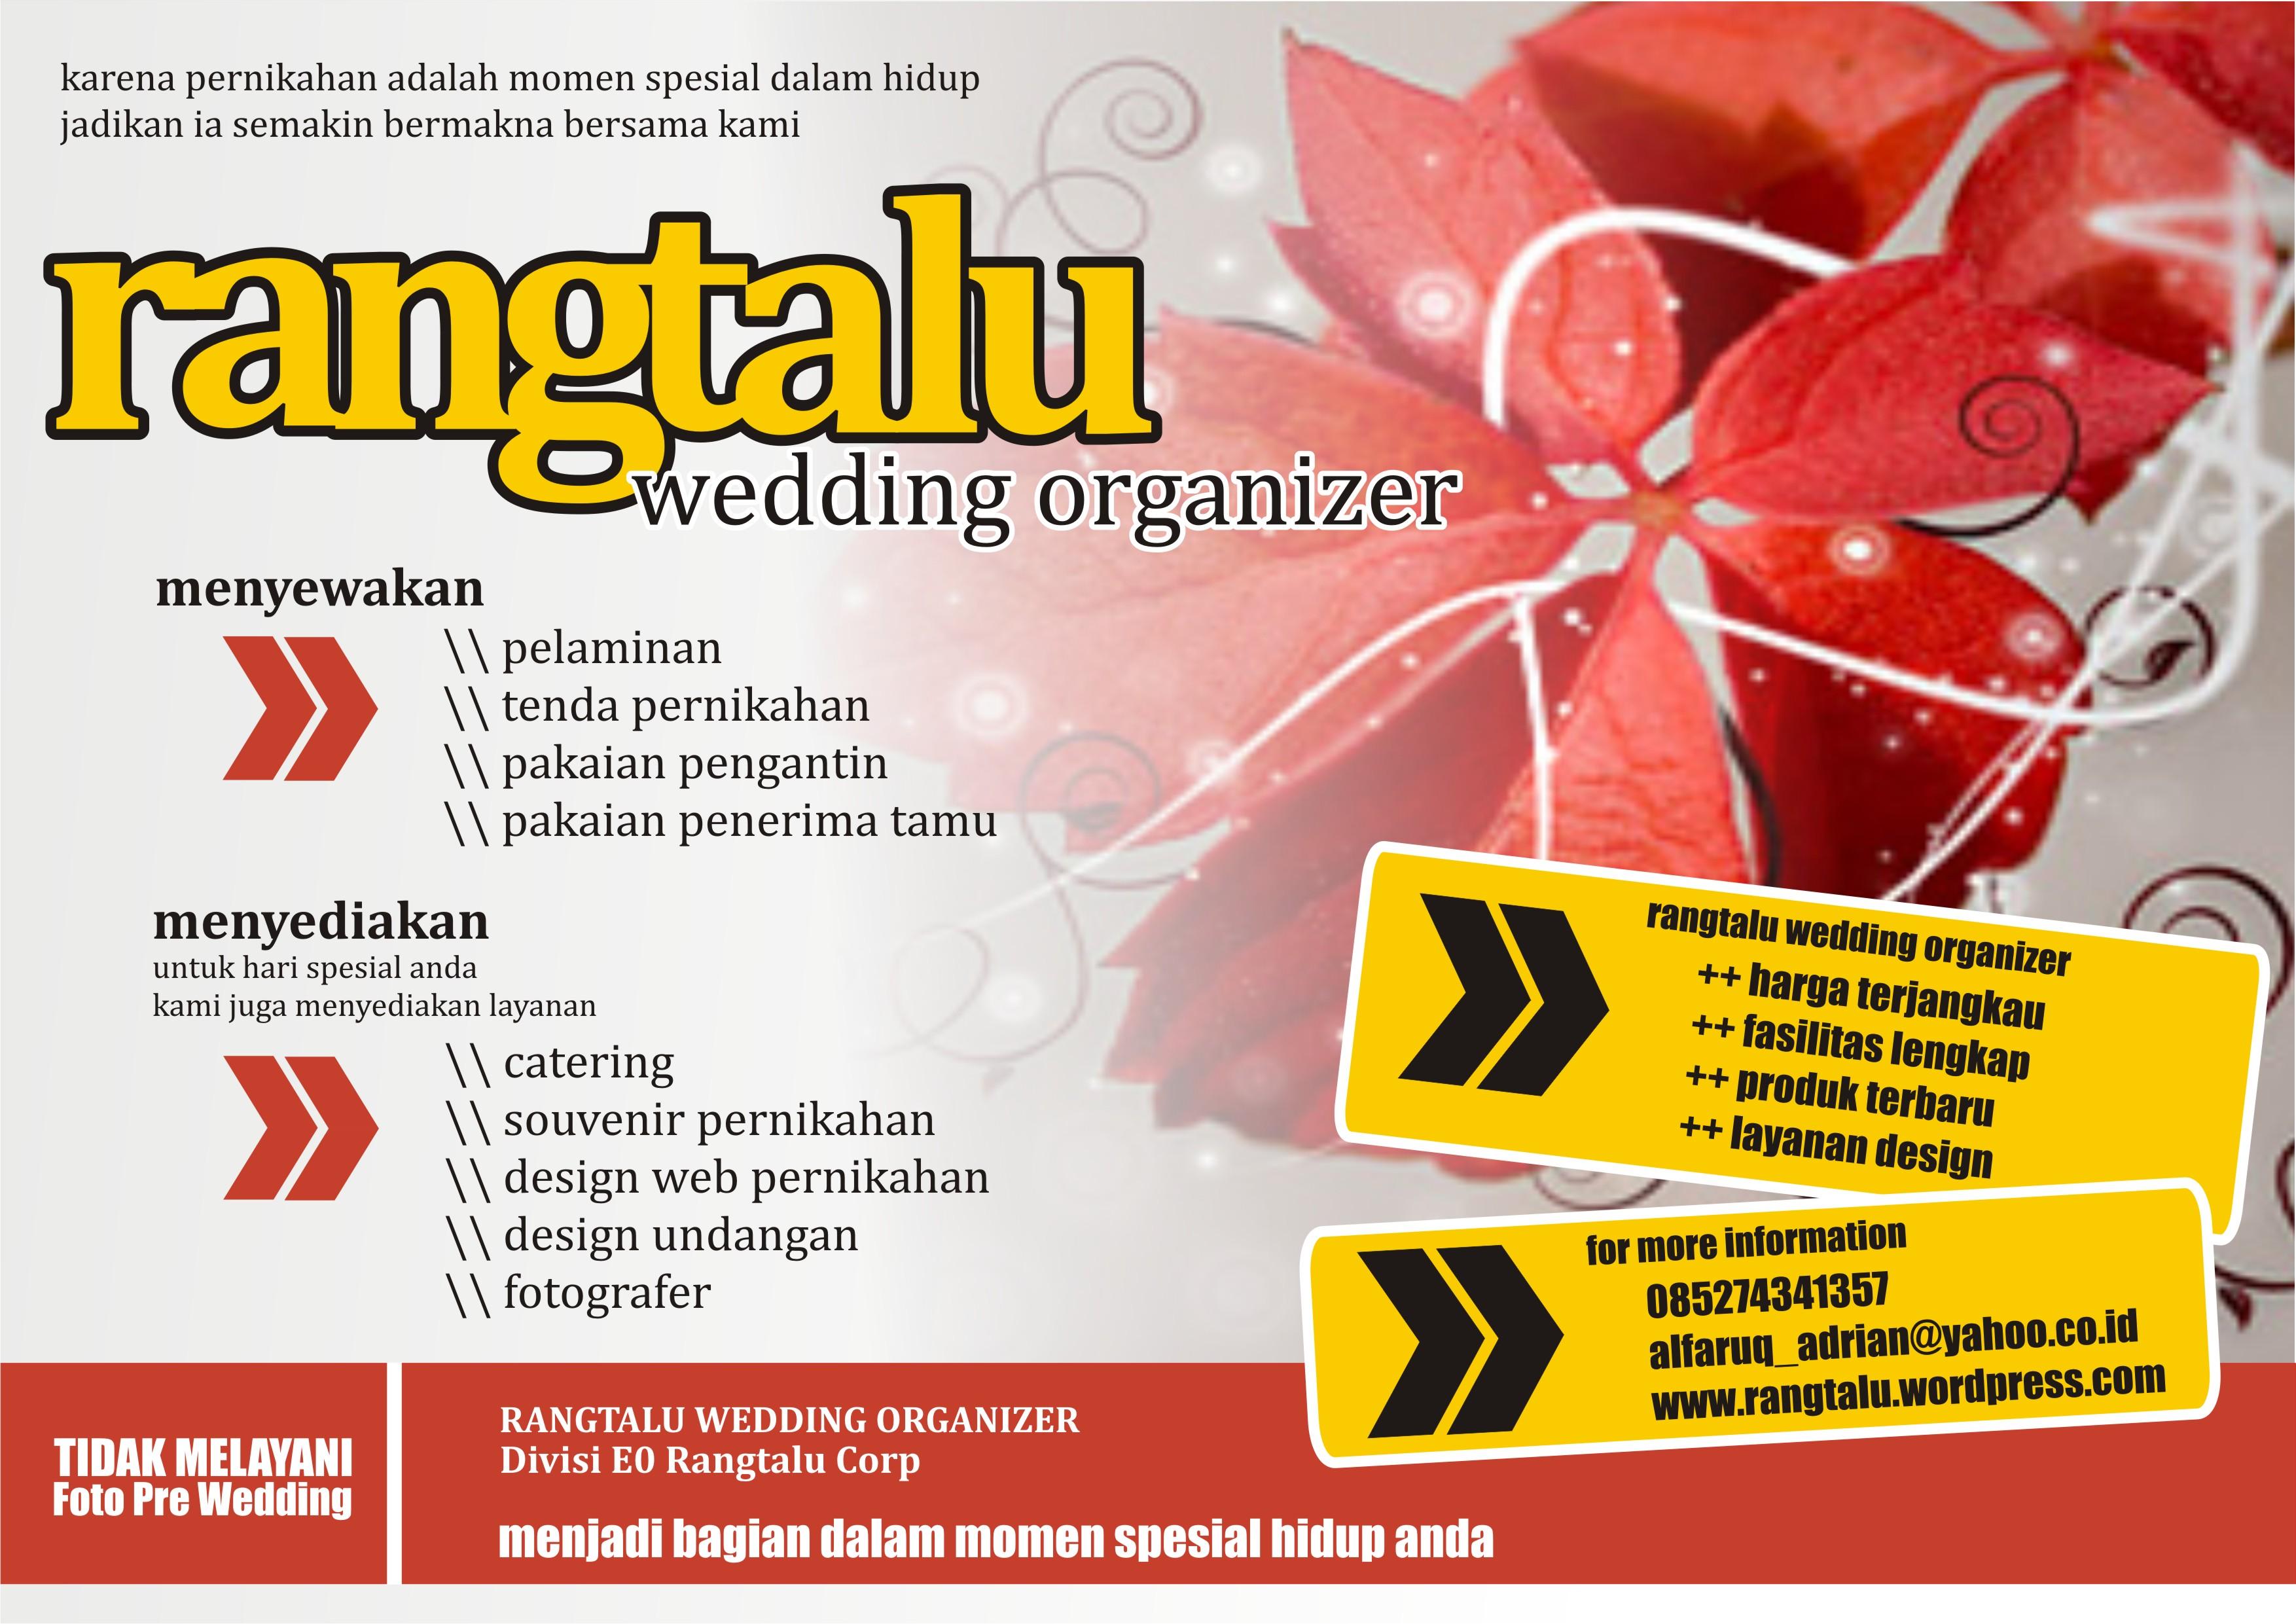 Rangtalu Wedding Organizer Rangtalu